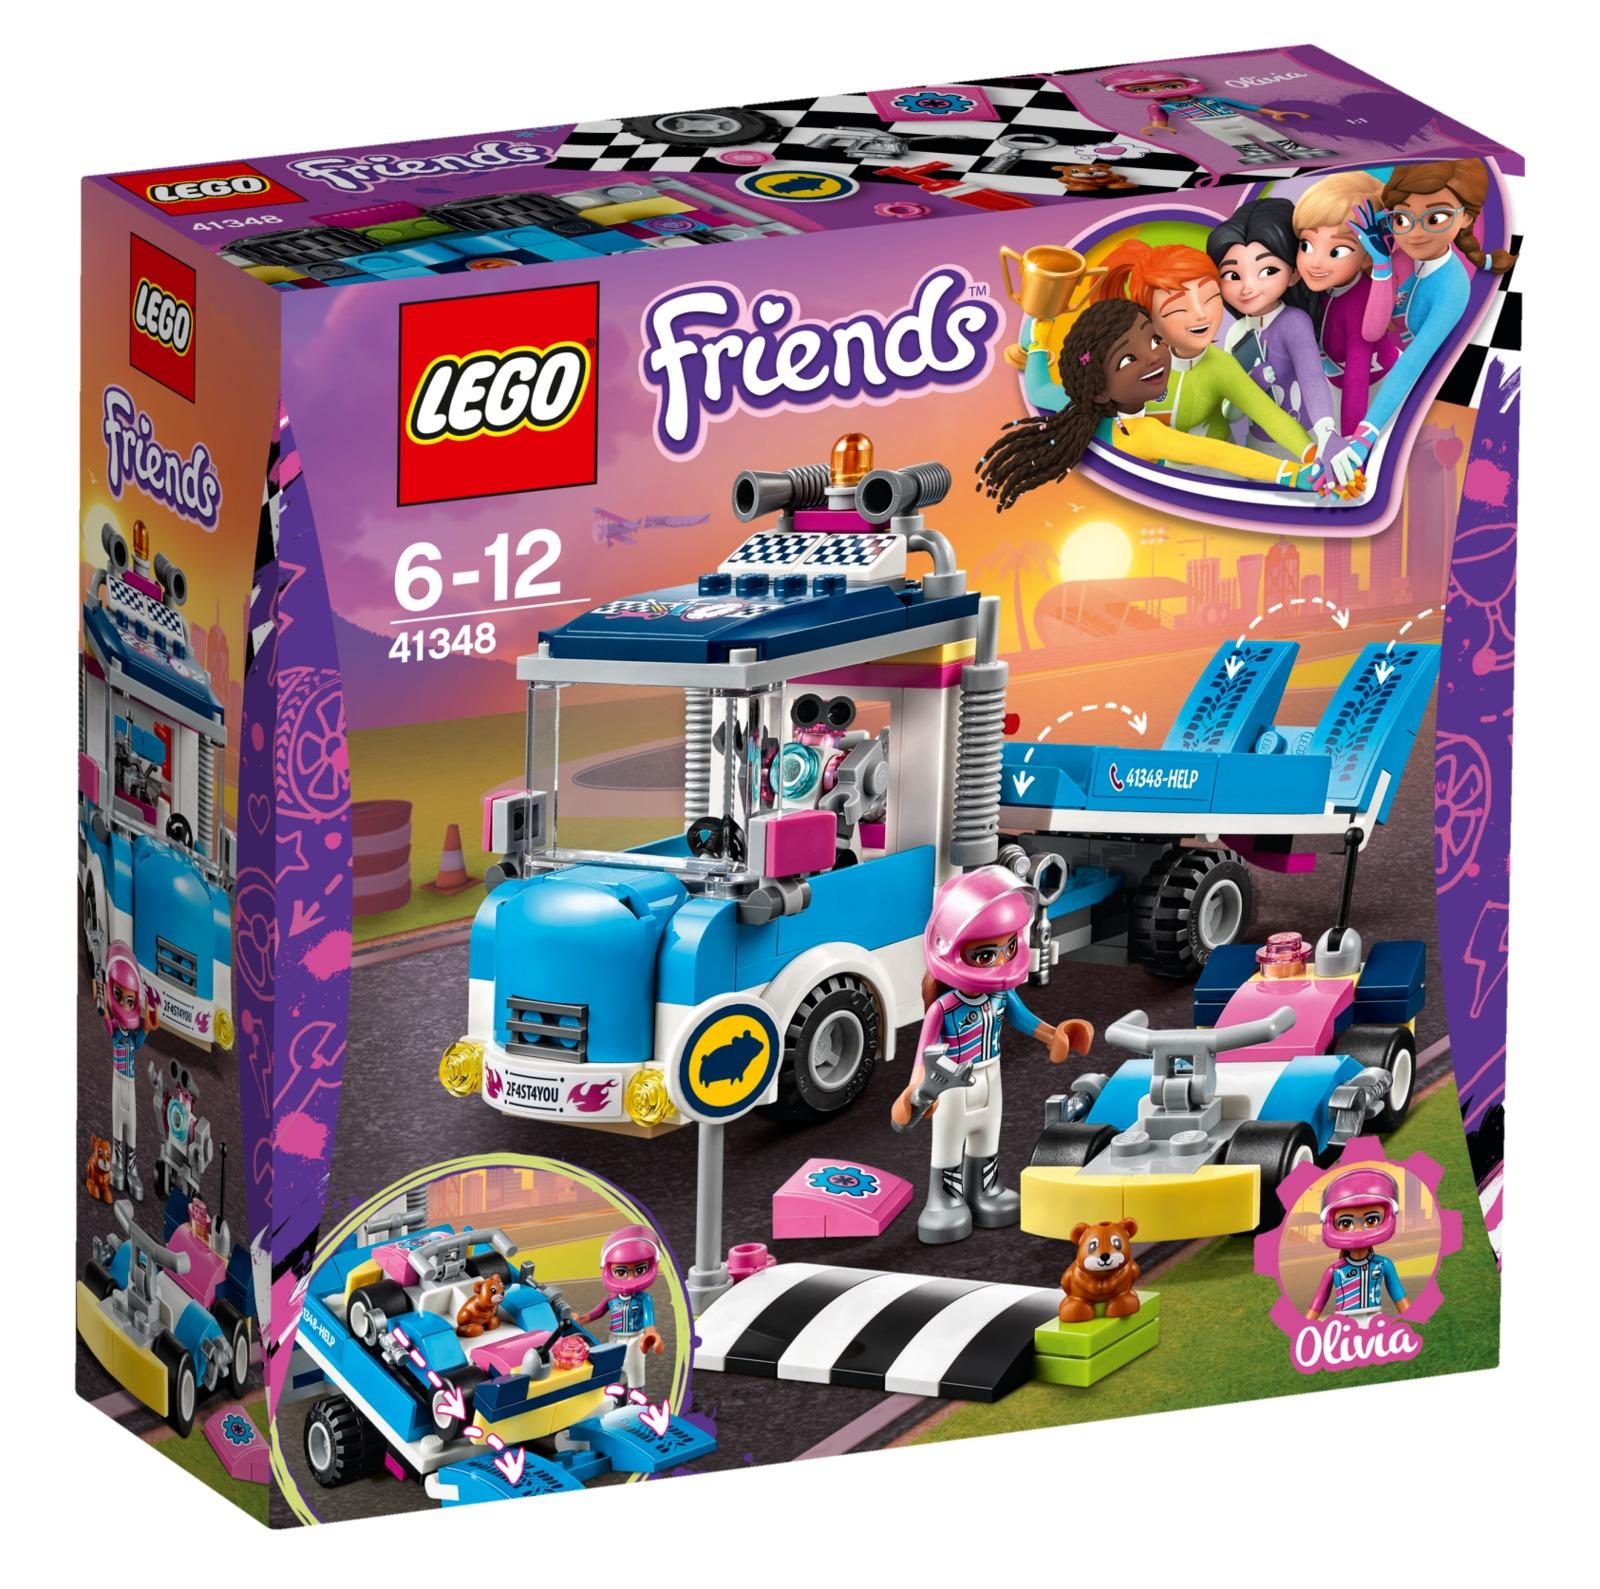 LEGO Friends - Service & Care Truck (41348) image